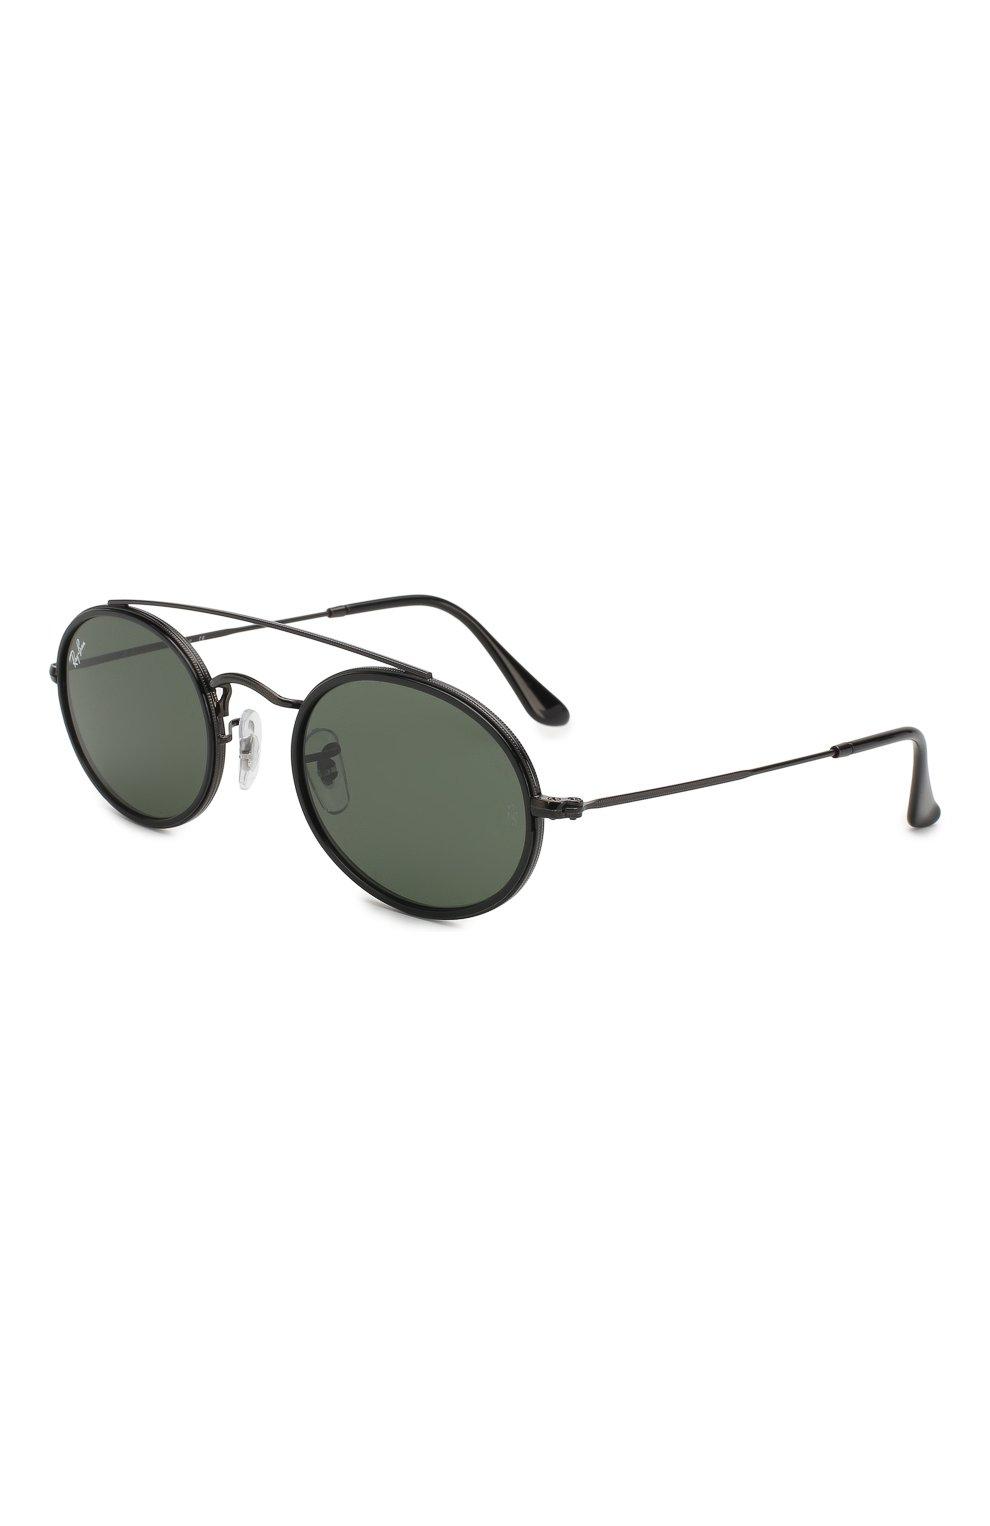 Мужские солнцезащитные очки RAY-BAN черного цвета, арт. 3847N-912031 | Фото 1